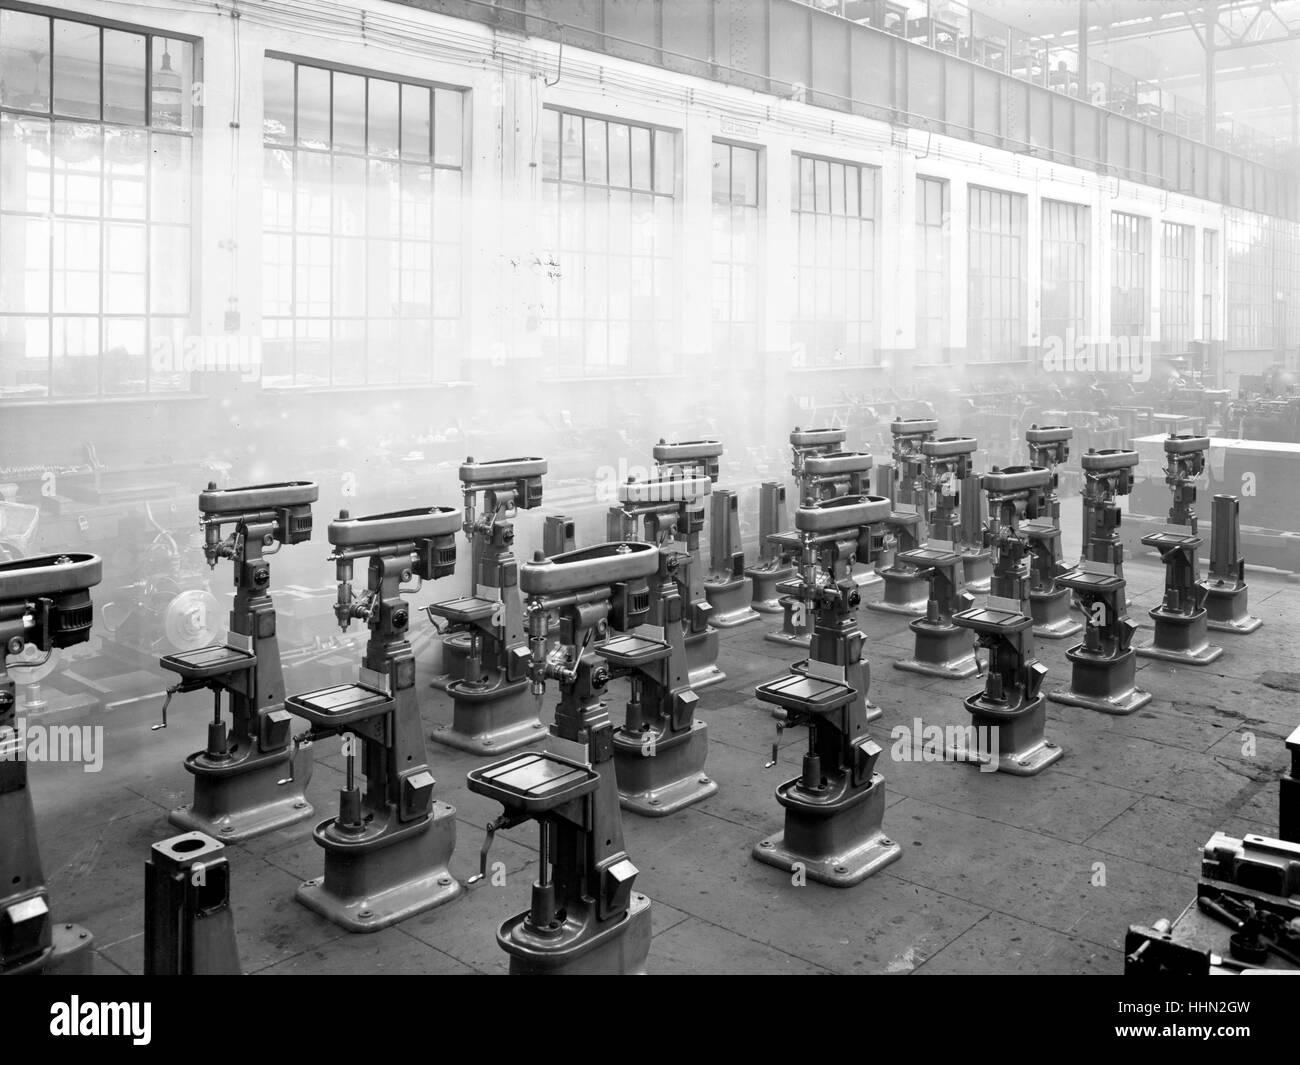 1930 - 40. Fiat - Ansaldo big motors Factory in Genua, San Pier d'Arena, sanpierdarena. - Stock Image